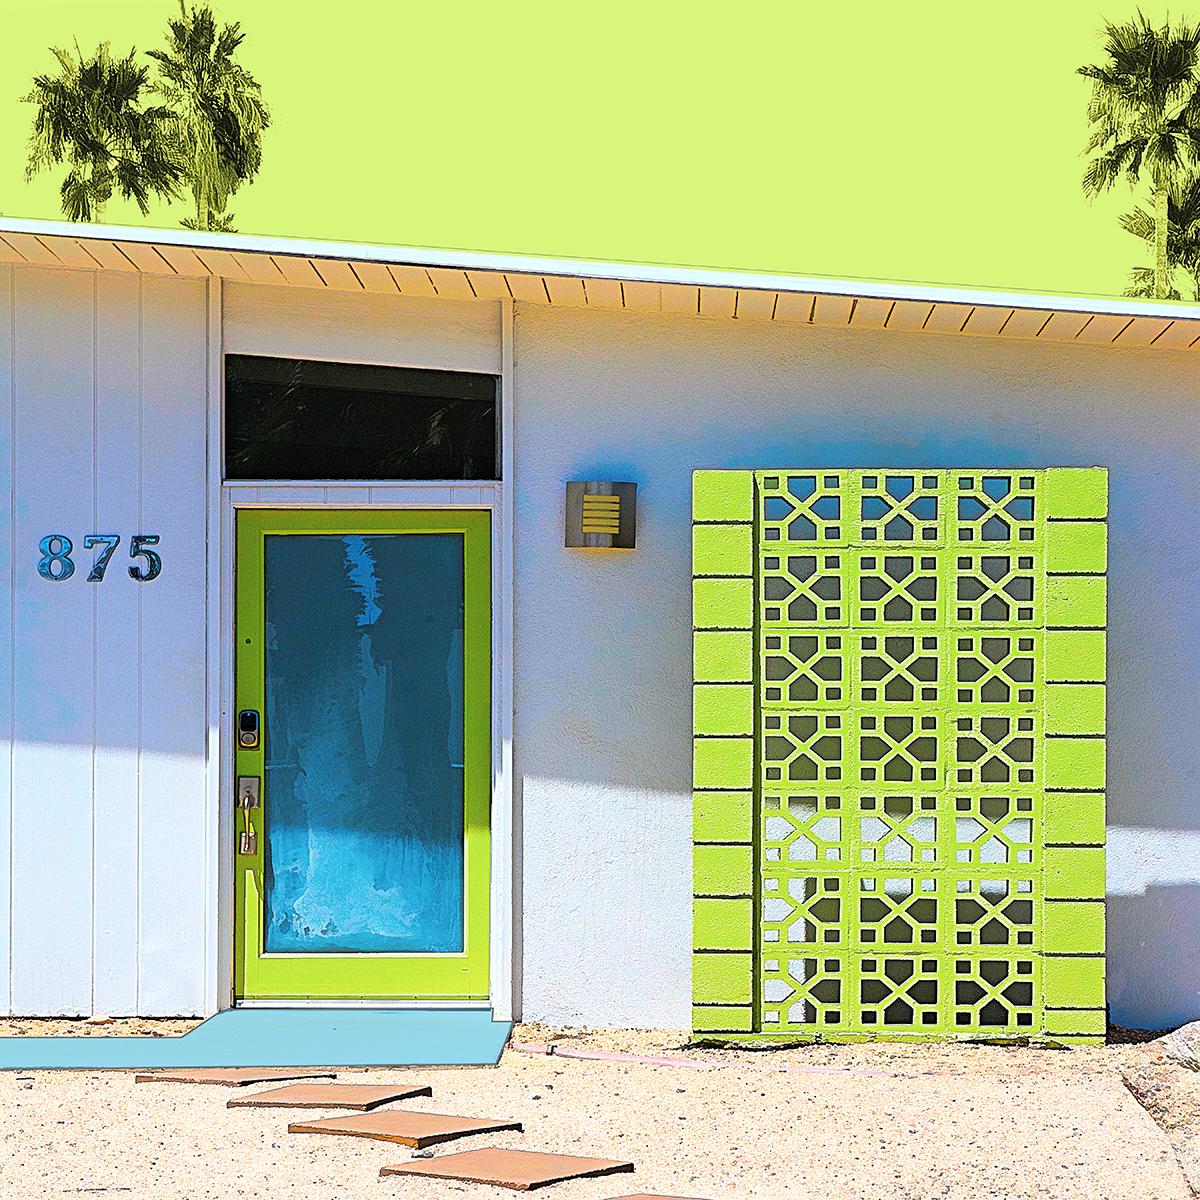 Janet_Milhomme_Midcentury Modern Forms_Palm Springs Mod 7_2.jpg